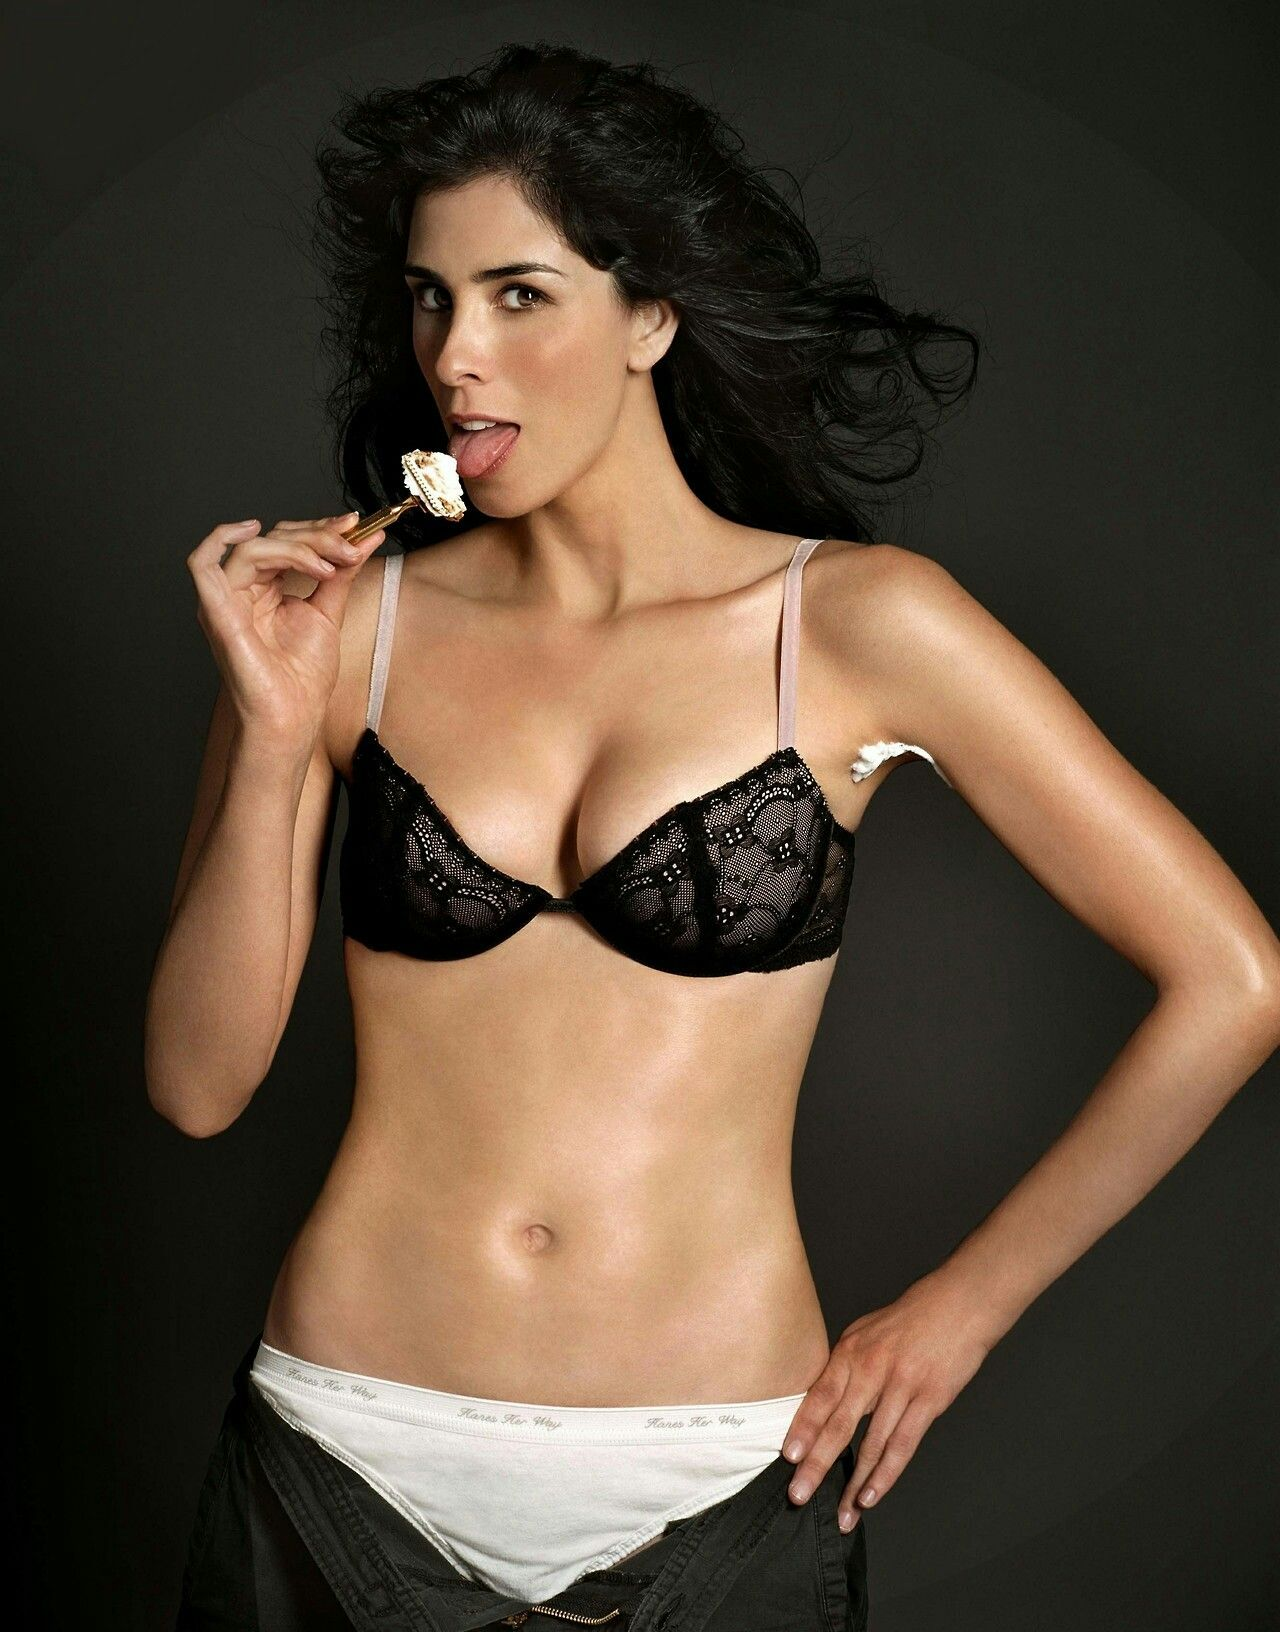 Hottest nude photos